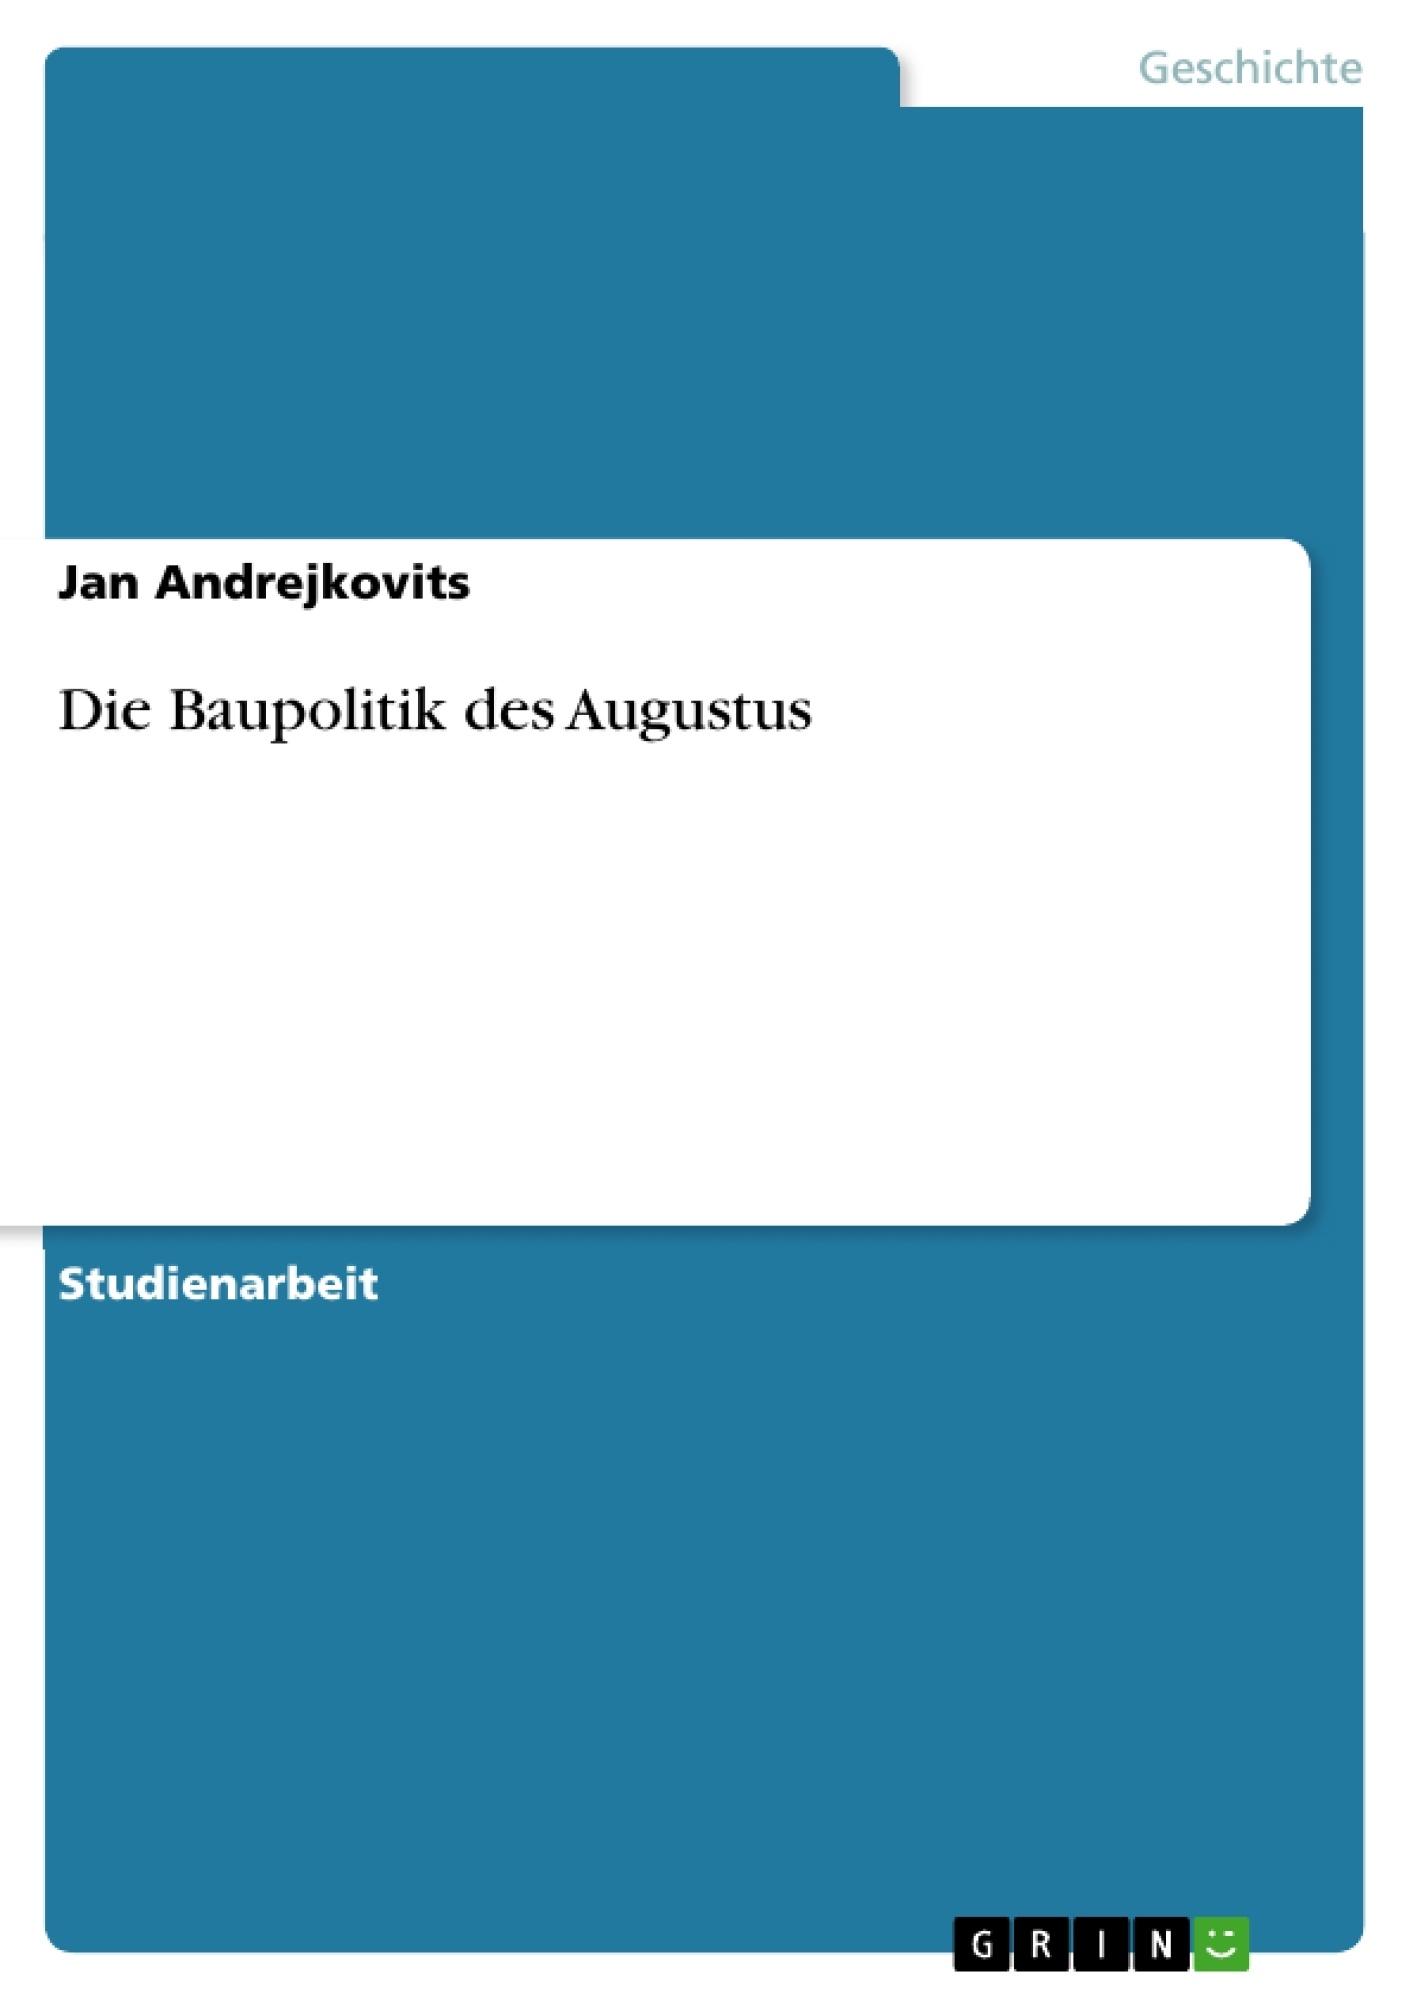 Titel: Die Baupolitik des Augustus